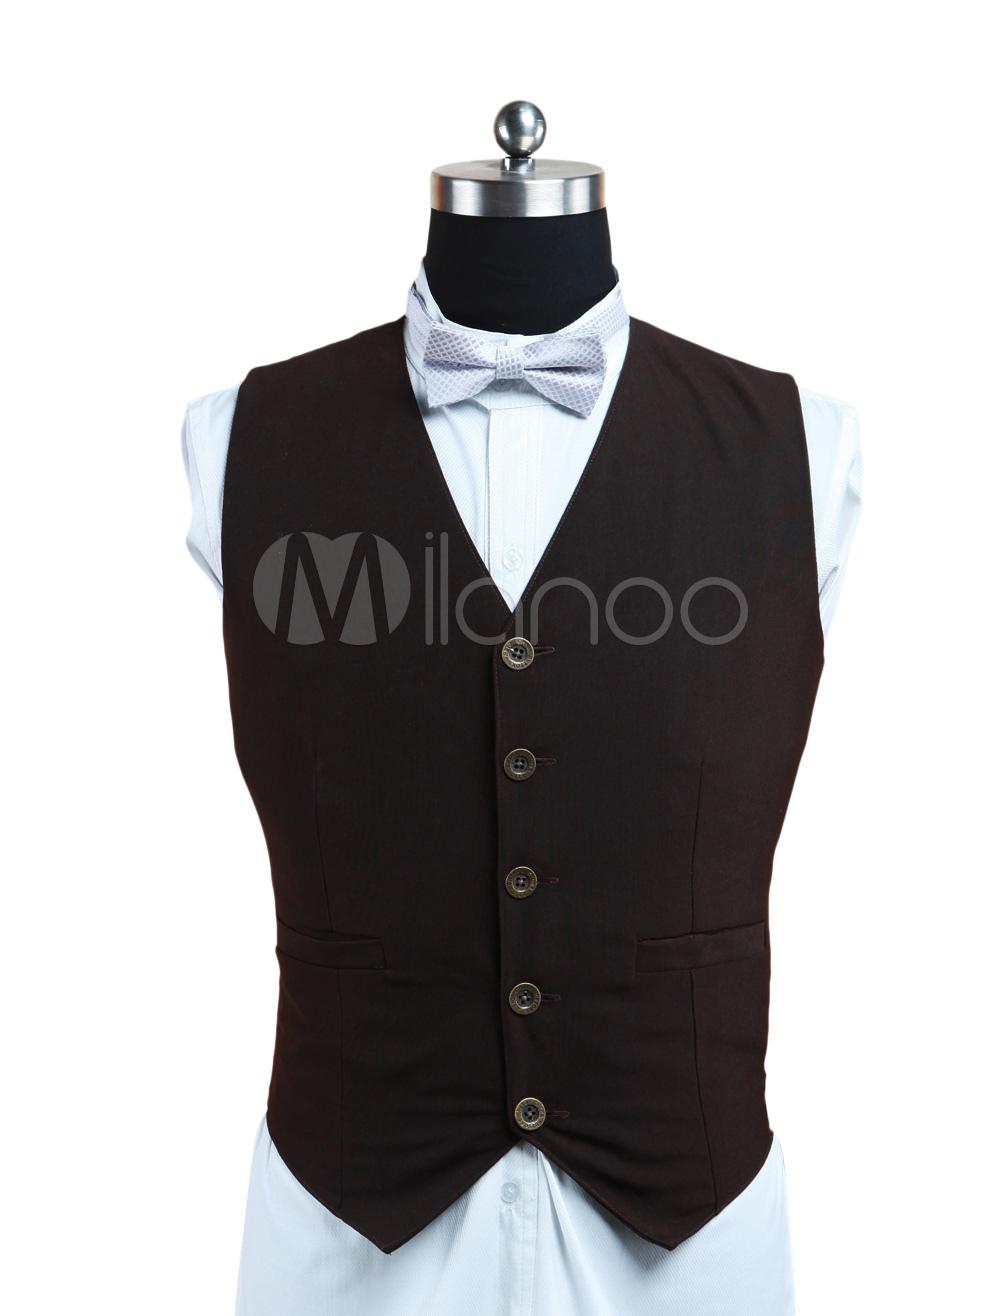 Buy Steampunk Men's Waistcoat Vintage Clothing Brown Suit Vest Halloween for $57.99 in Milanoo store